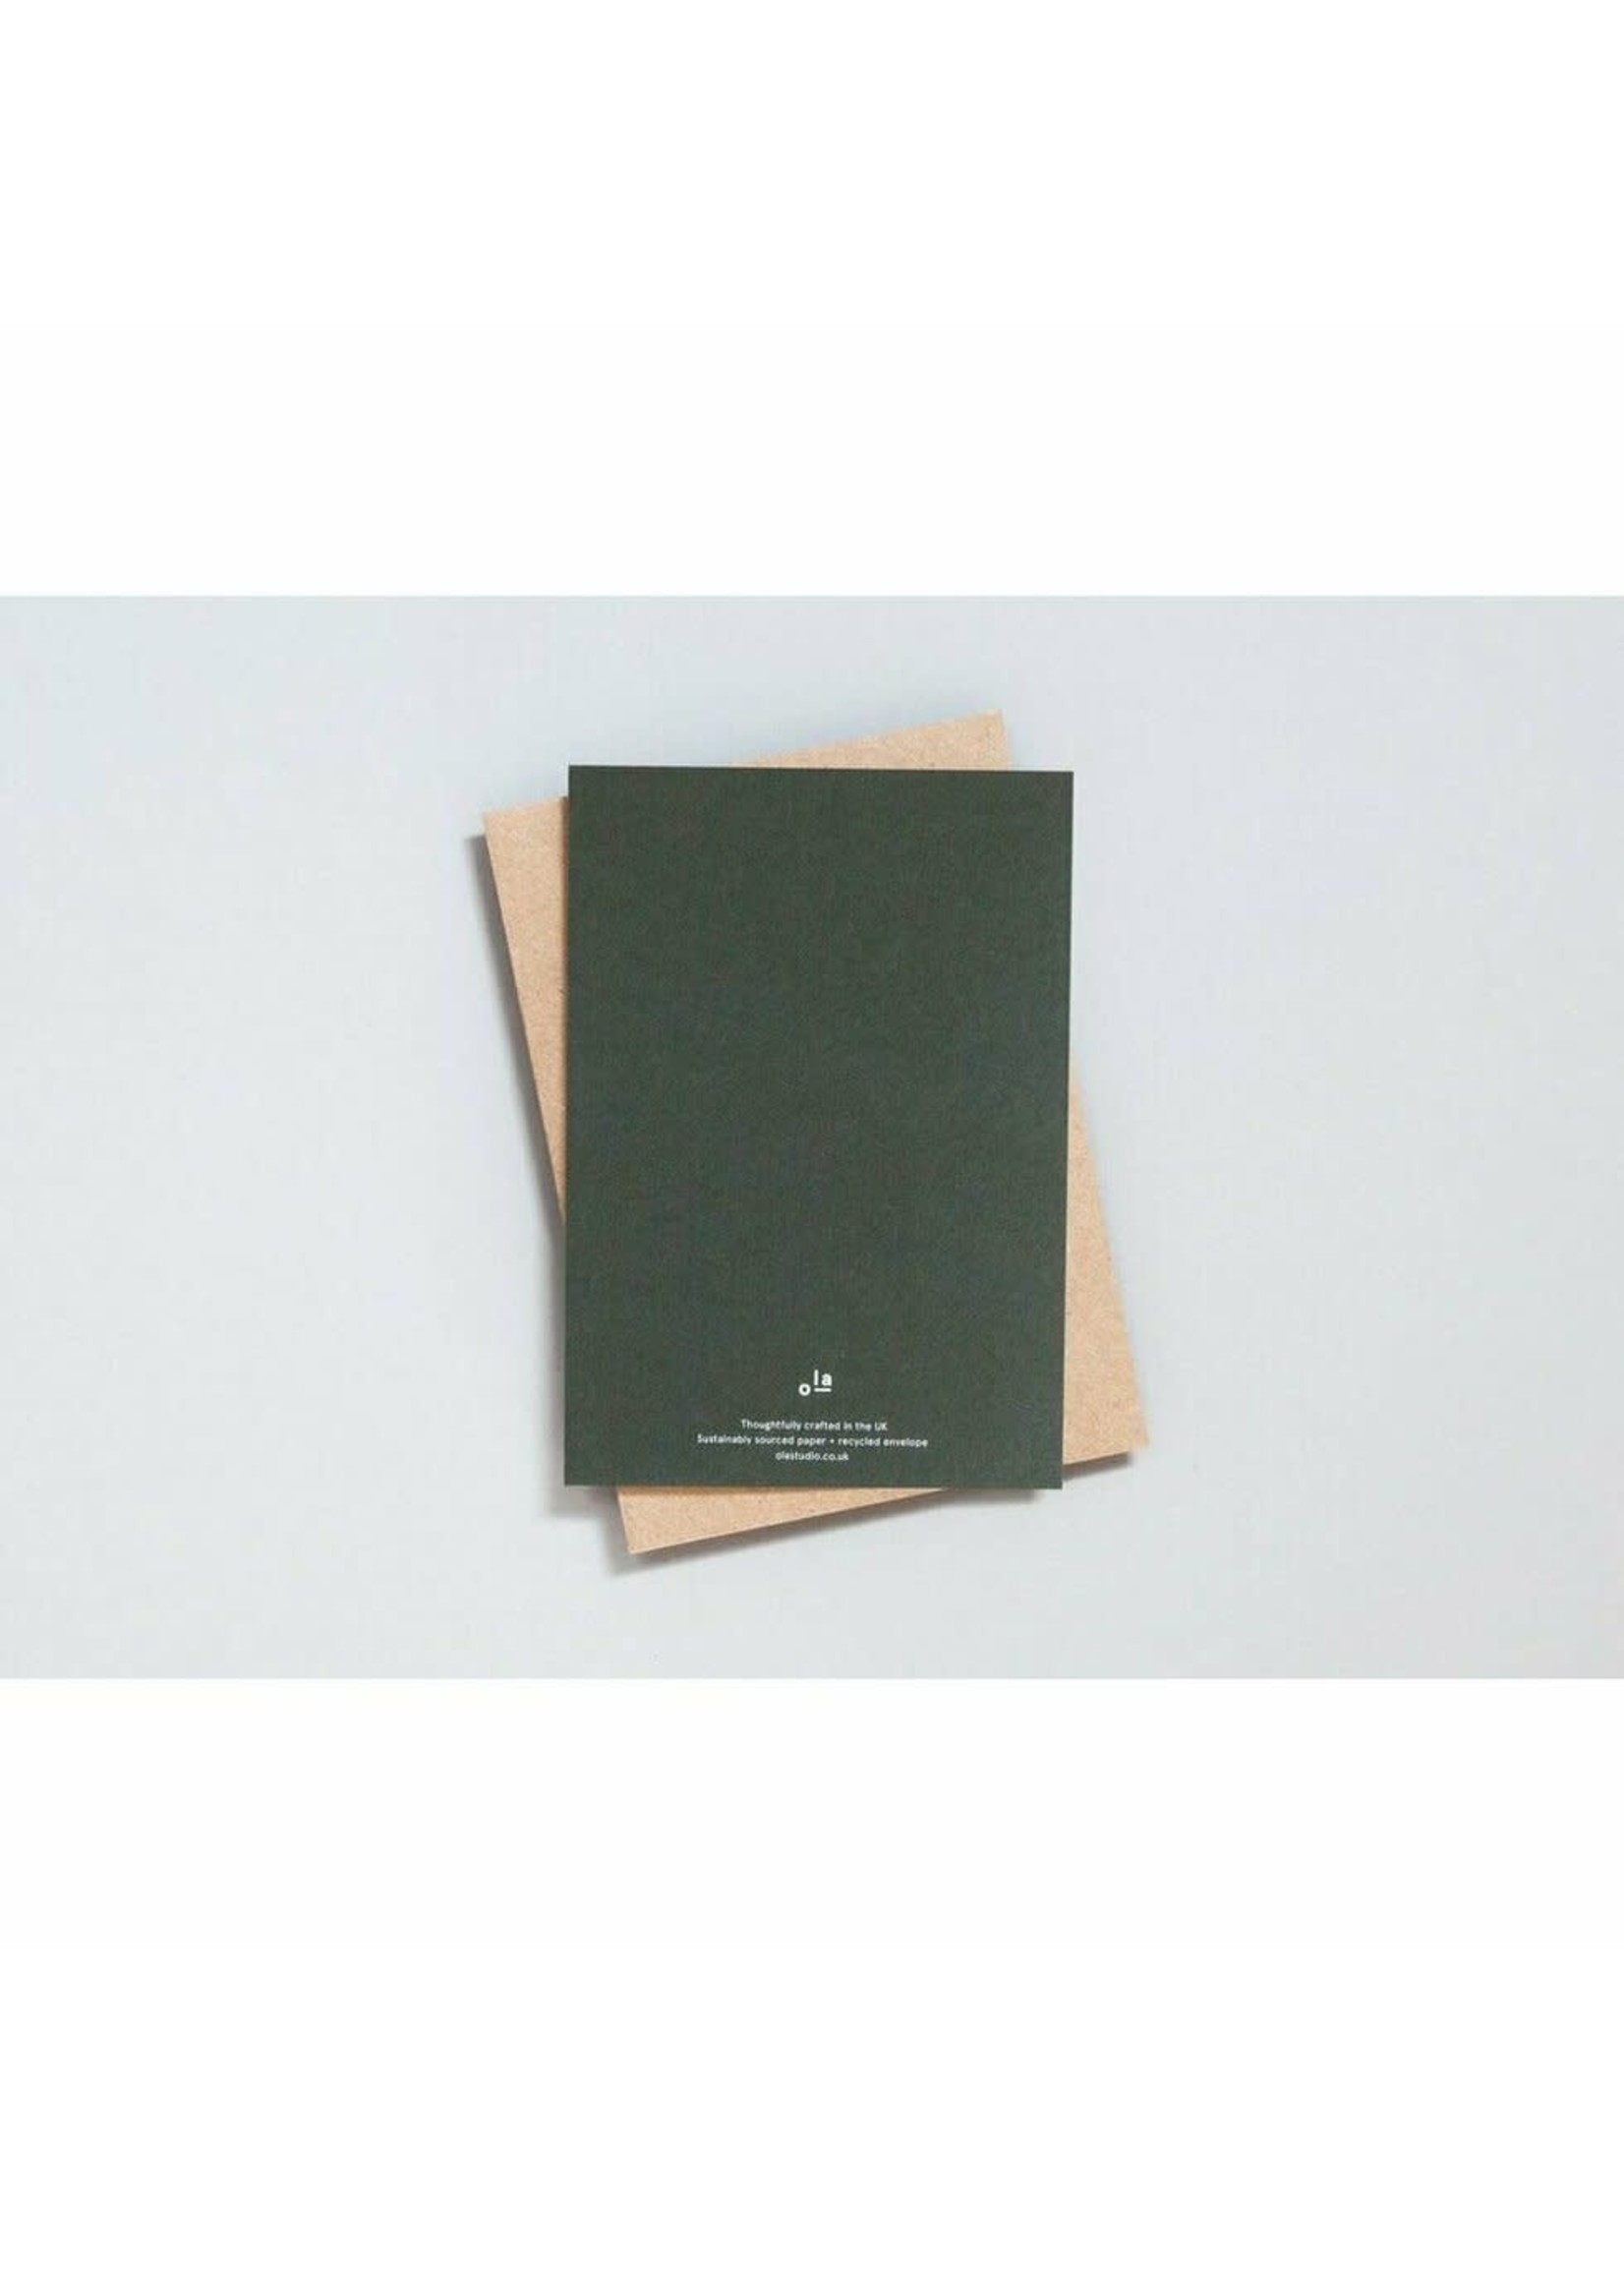 Ola Ola Foil Blocked Cards: Bauble Green/Brass